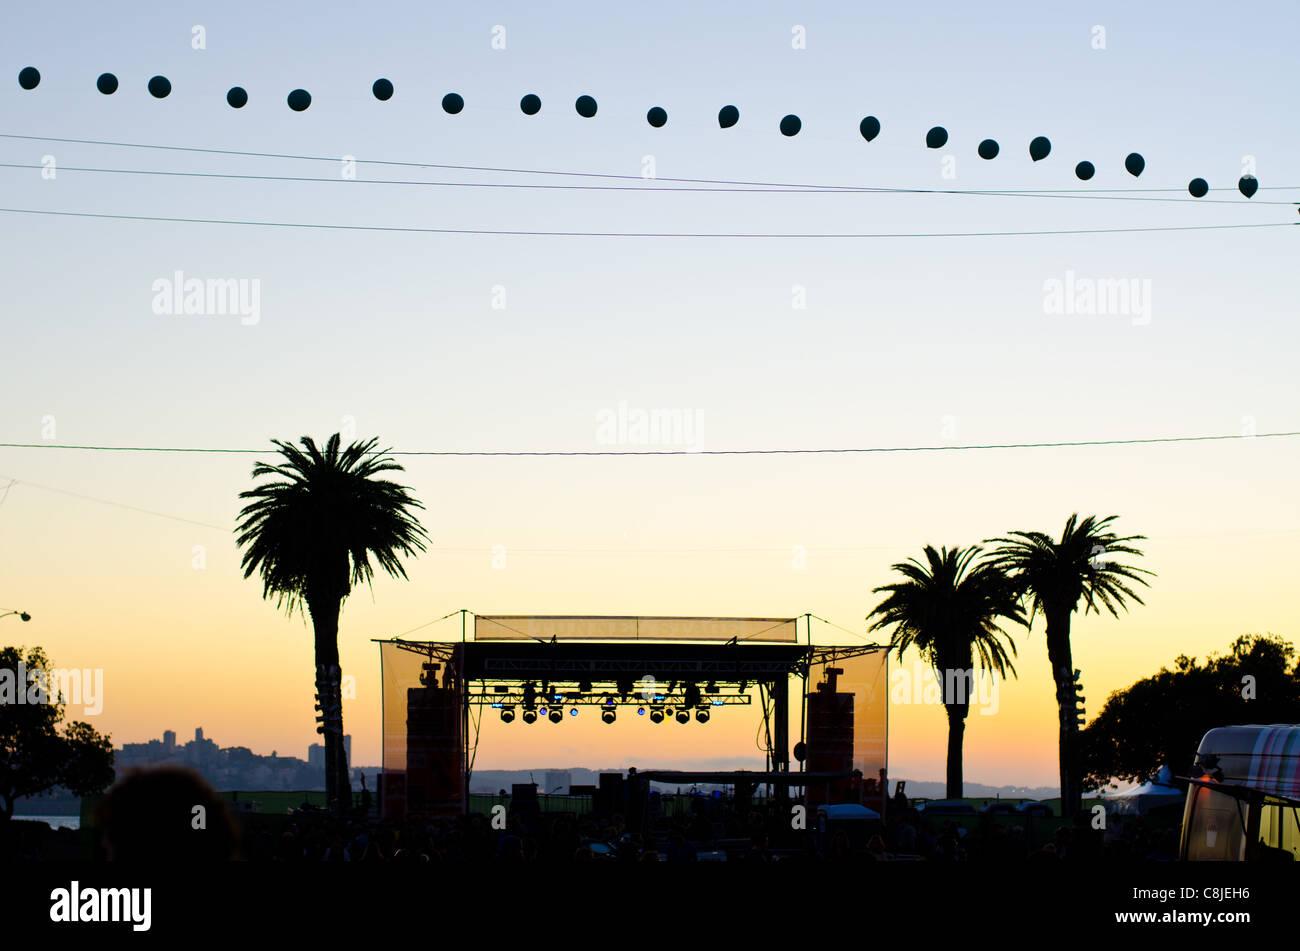 Suntset behind the stage at Treasure Island Music festival, San Francisco, California - Stock Image